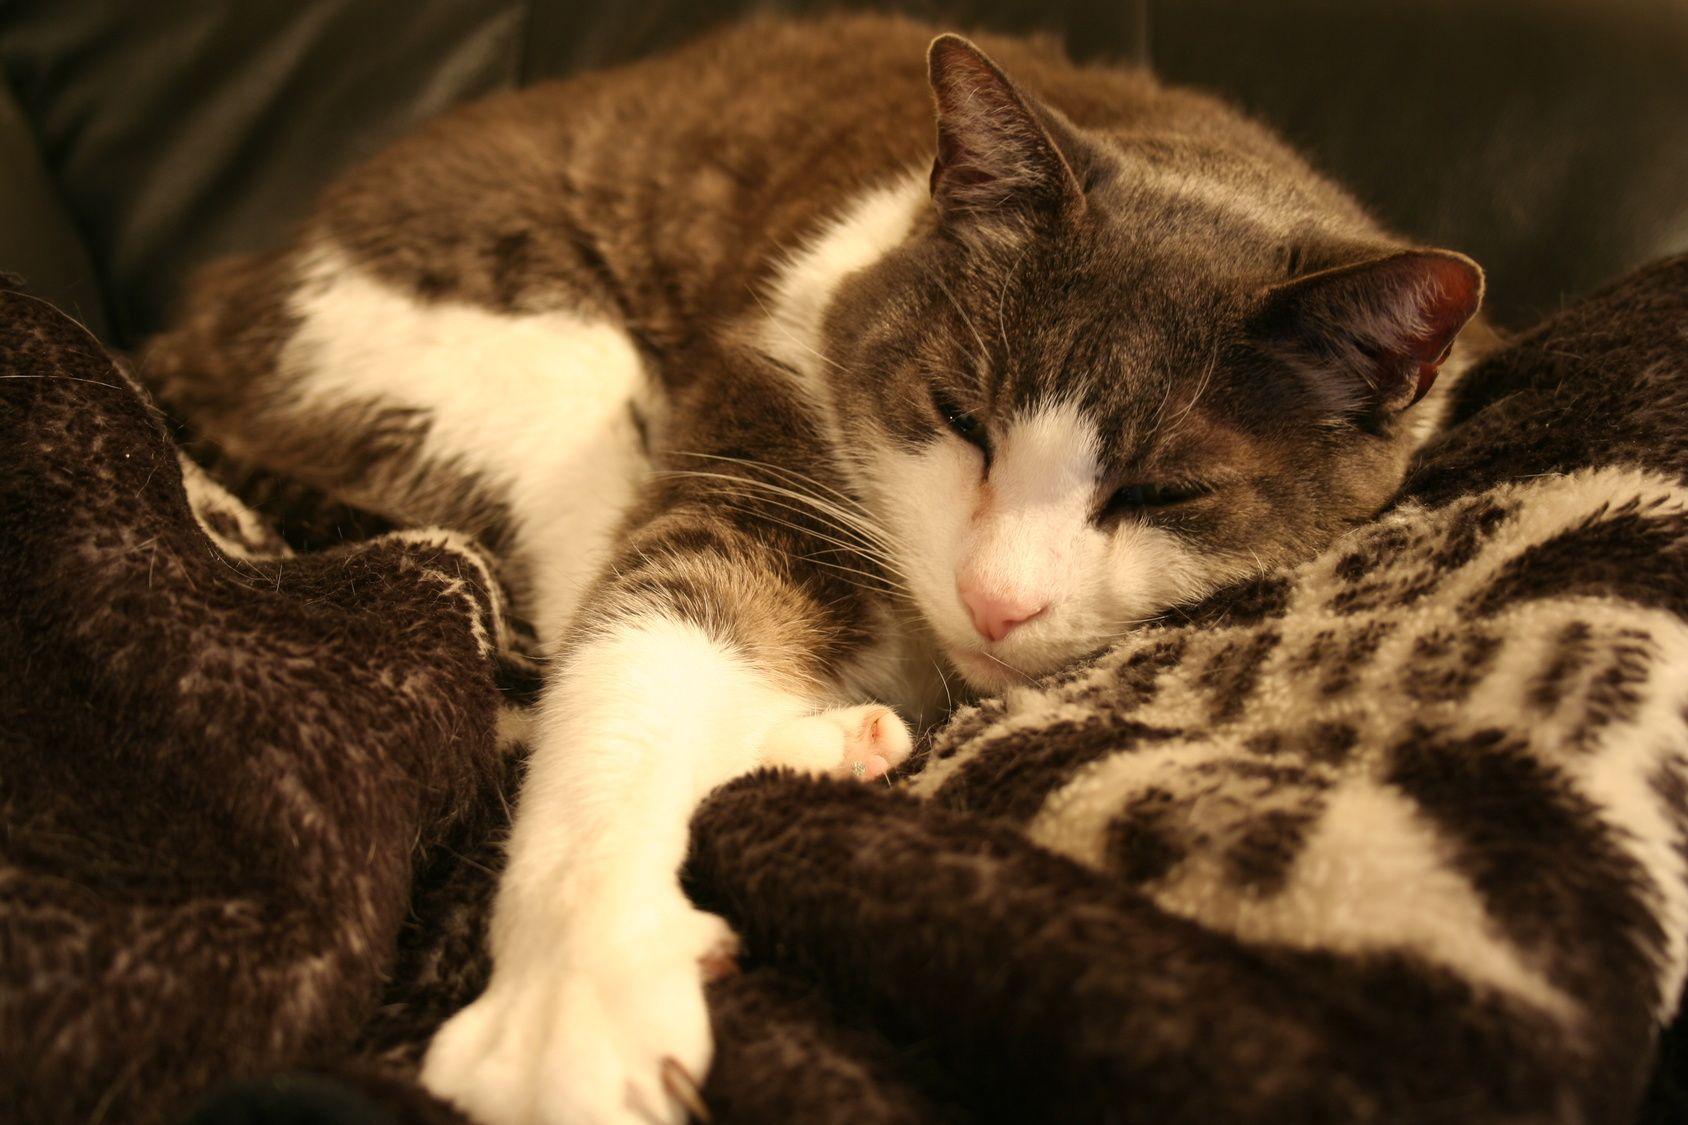 Can a Cat's Purr Stimulate Healing? Cat purr, Cats, Purring